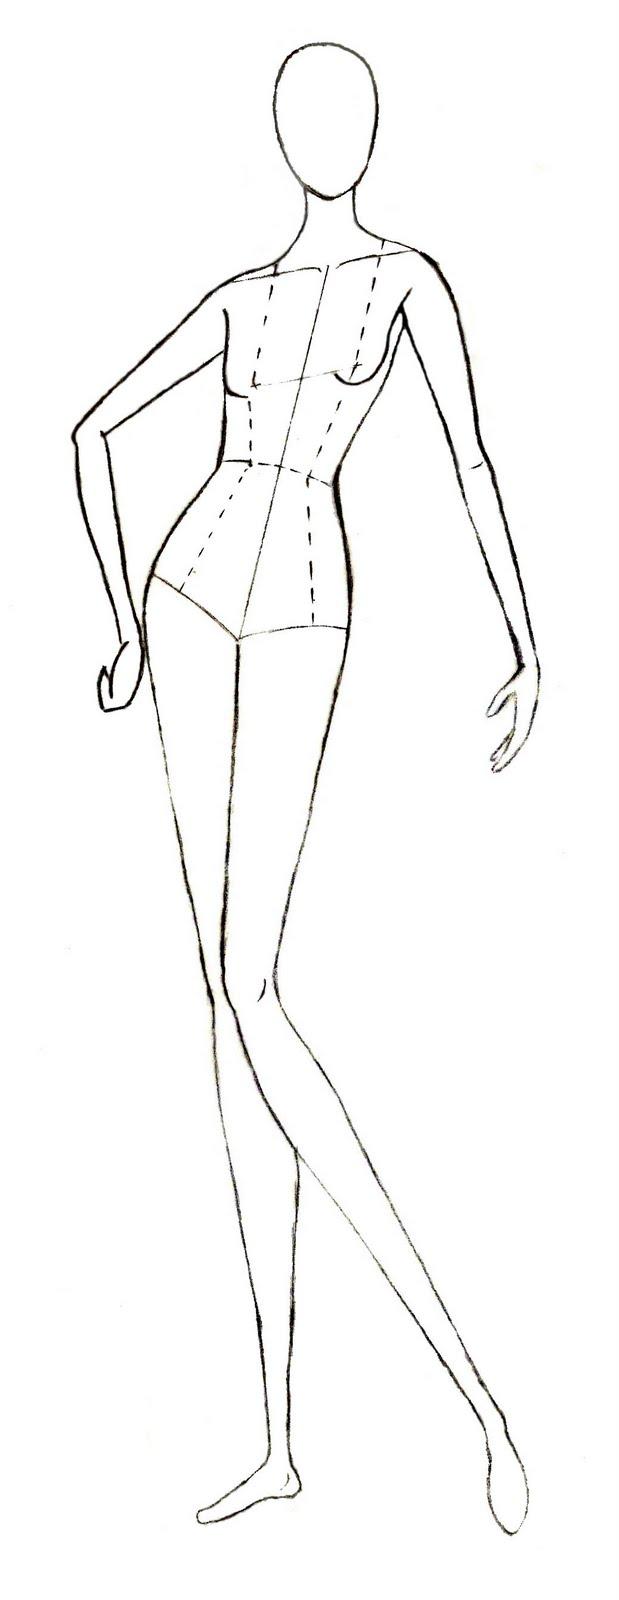 619x1600 Human Body Drawing Model